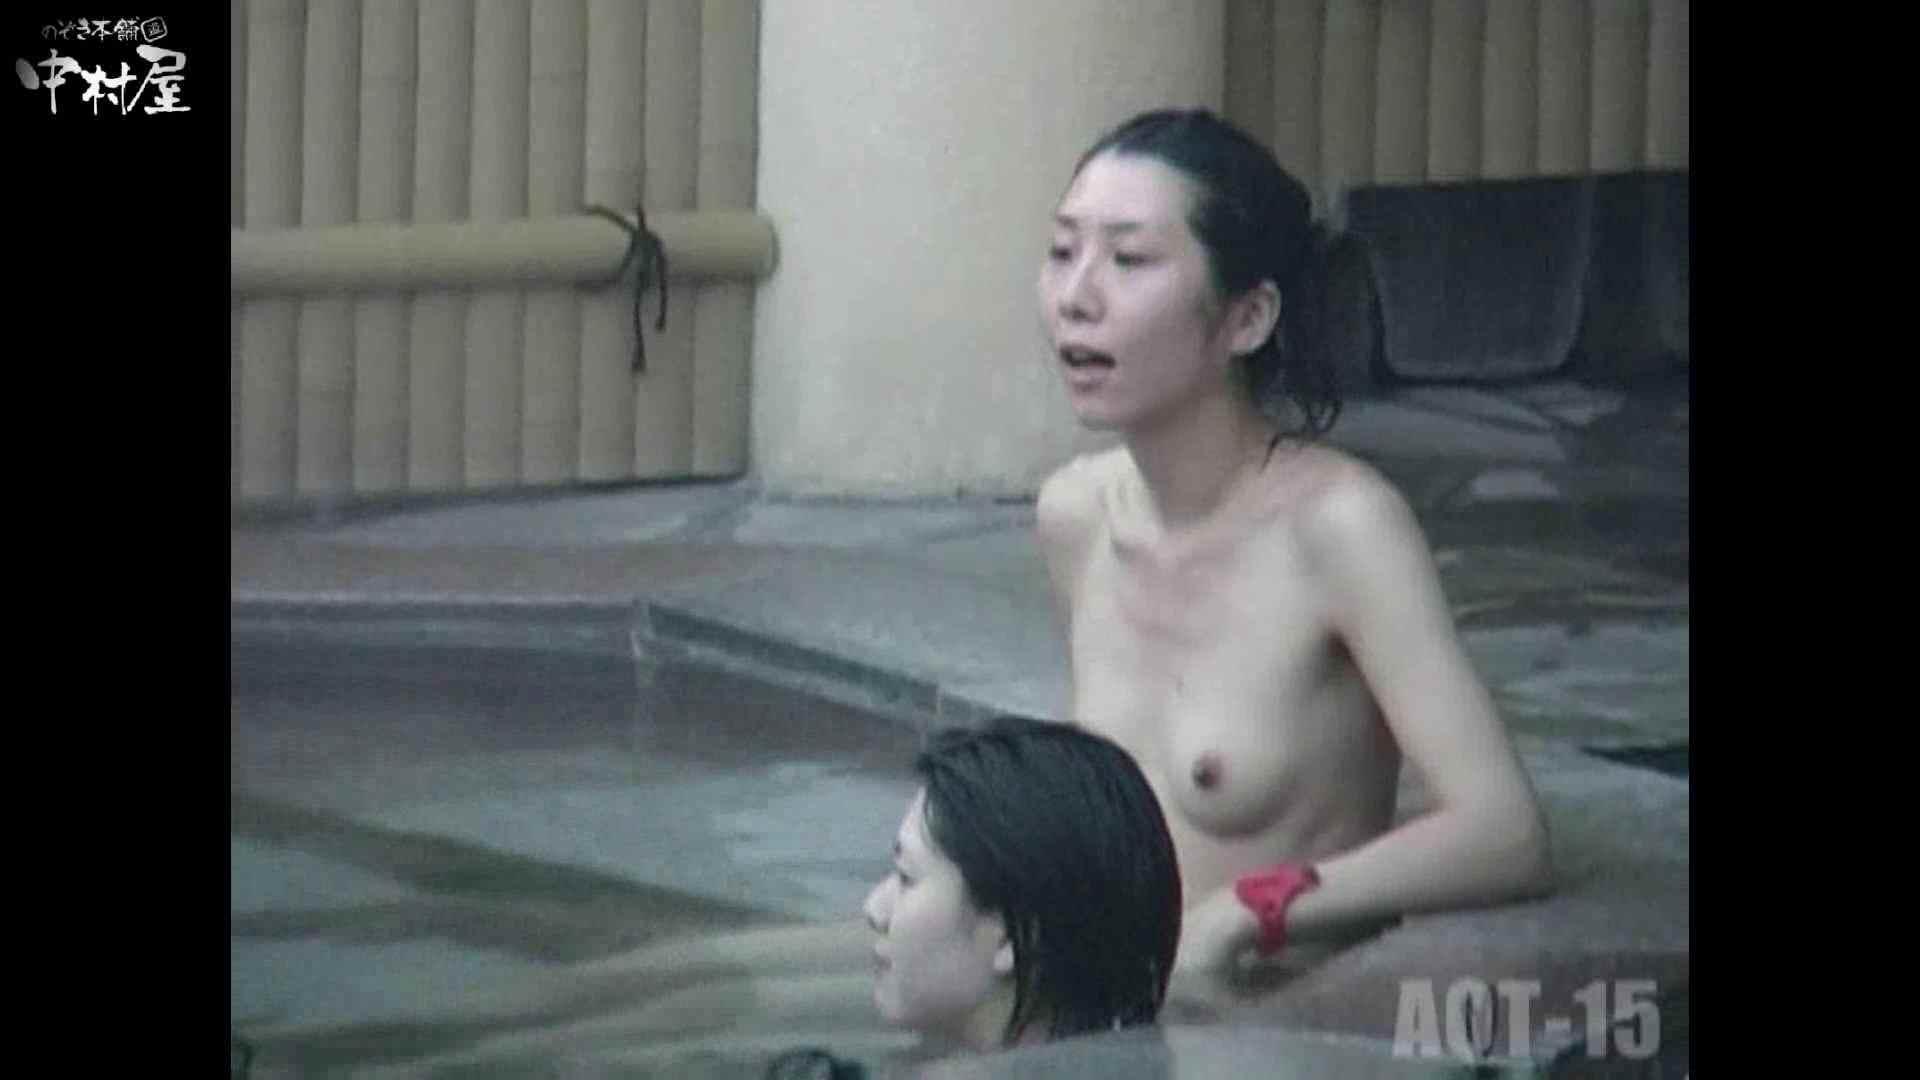 Aquaな露天風呂Vol.878潜入盗撮露天風呂十五判湯 其の七 盗撮シリーズ エロ画像 97PIX 29